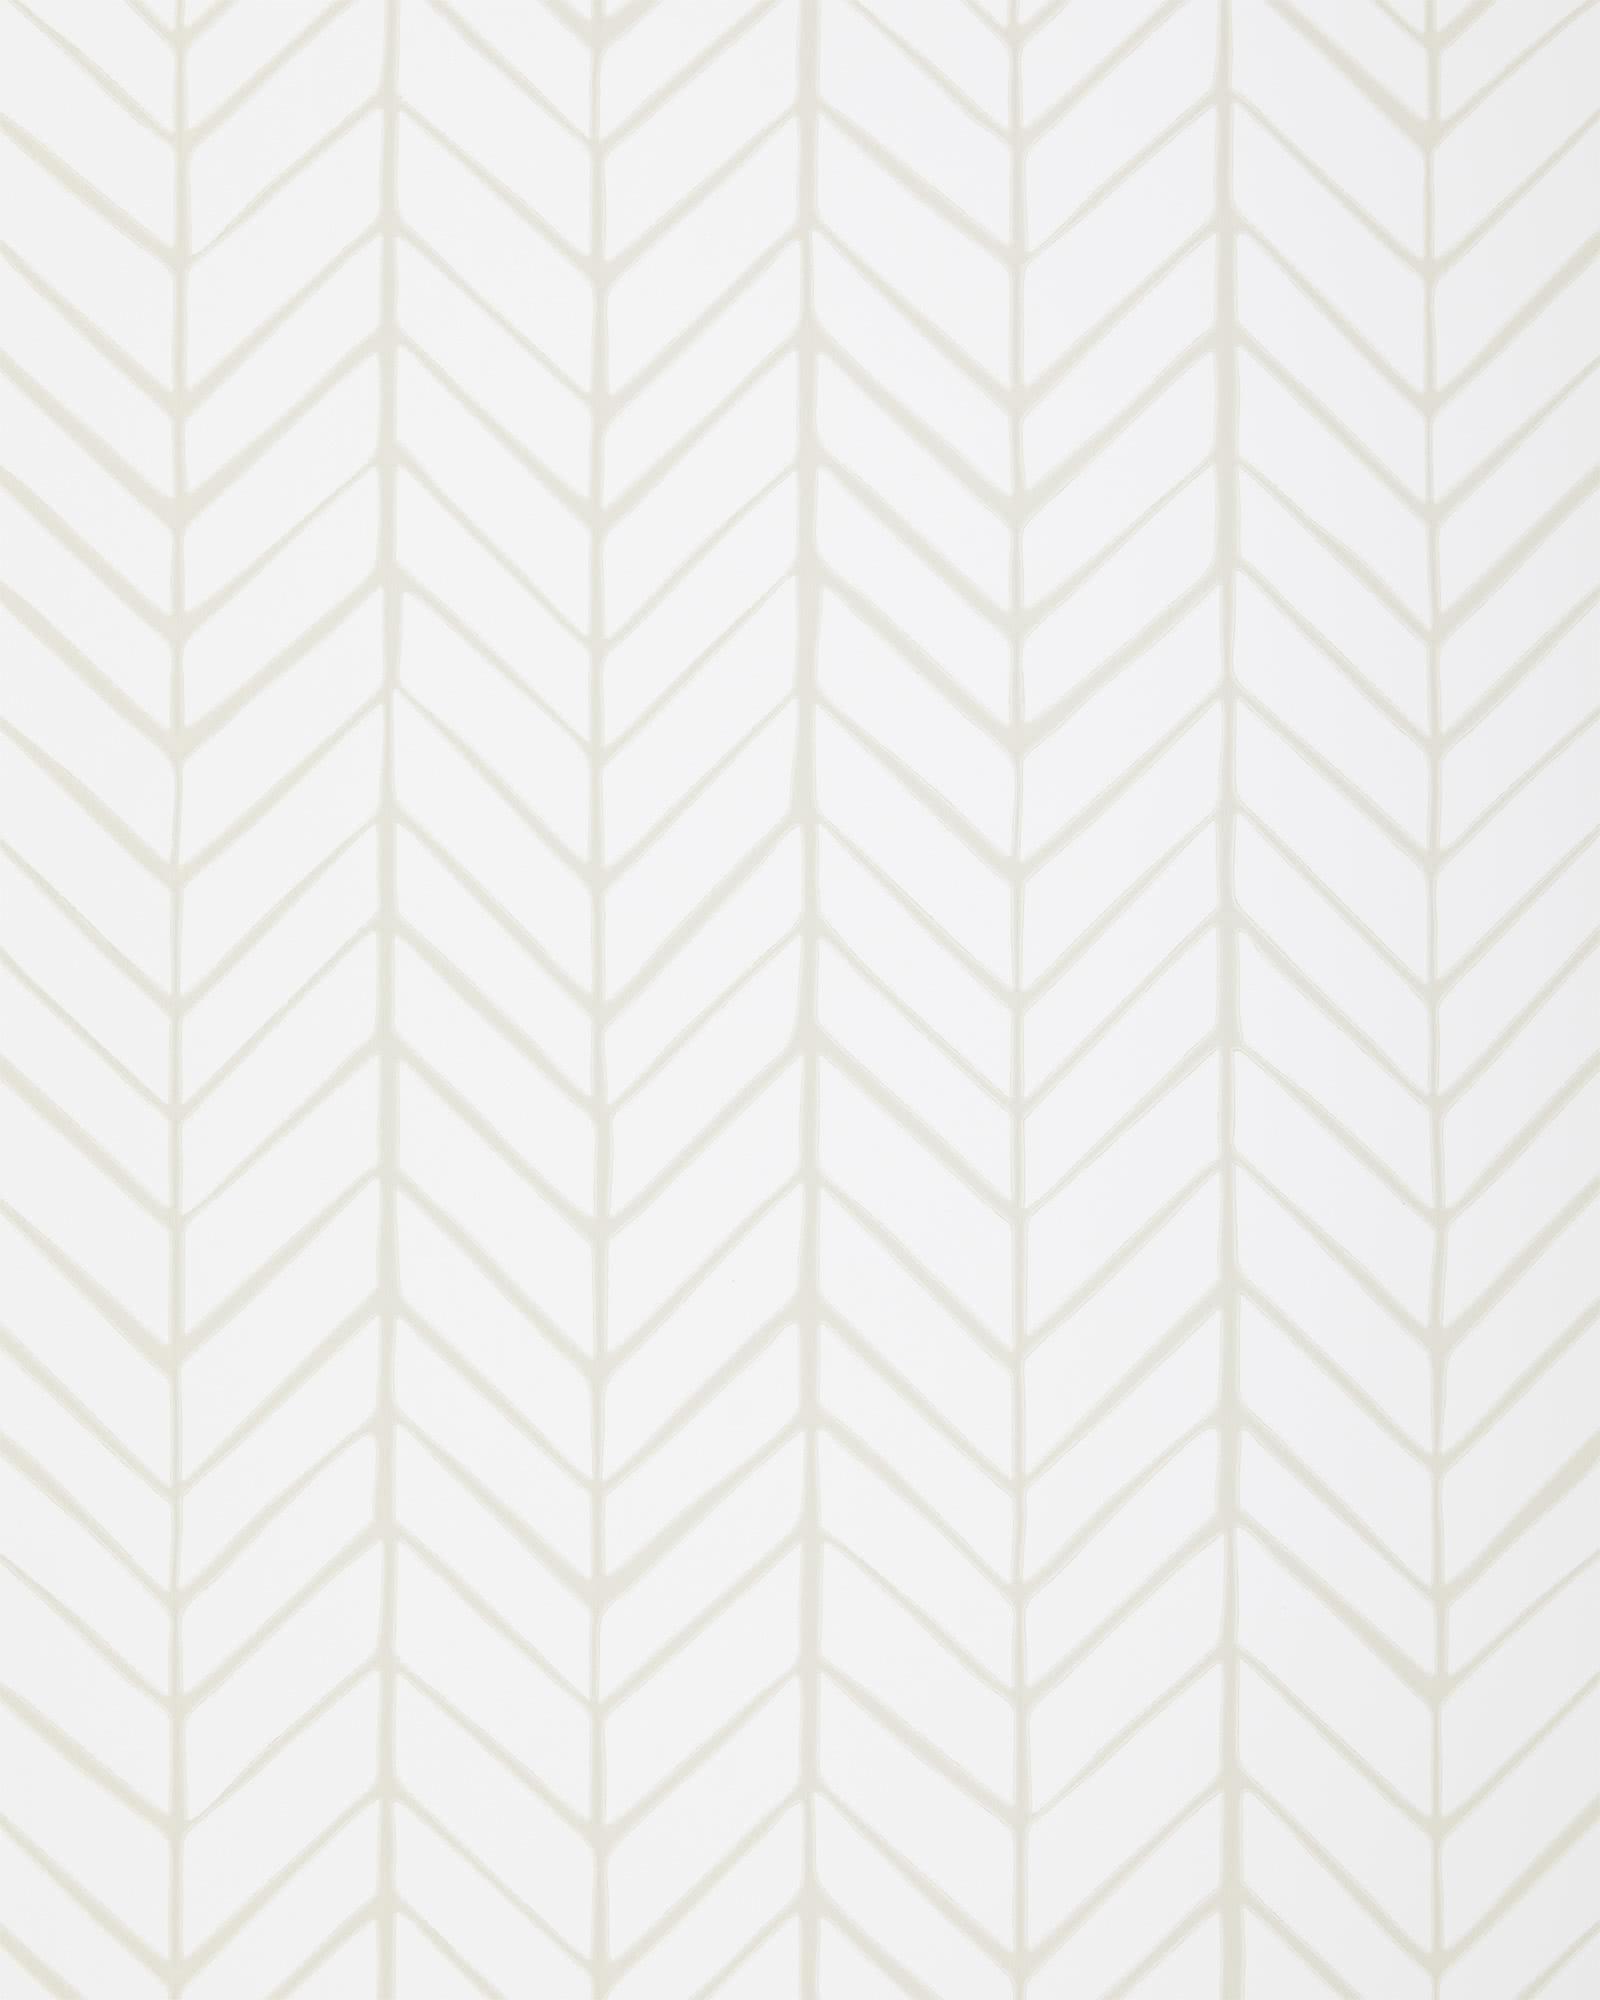 Feather Wallpaper - Bone